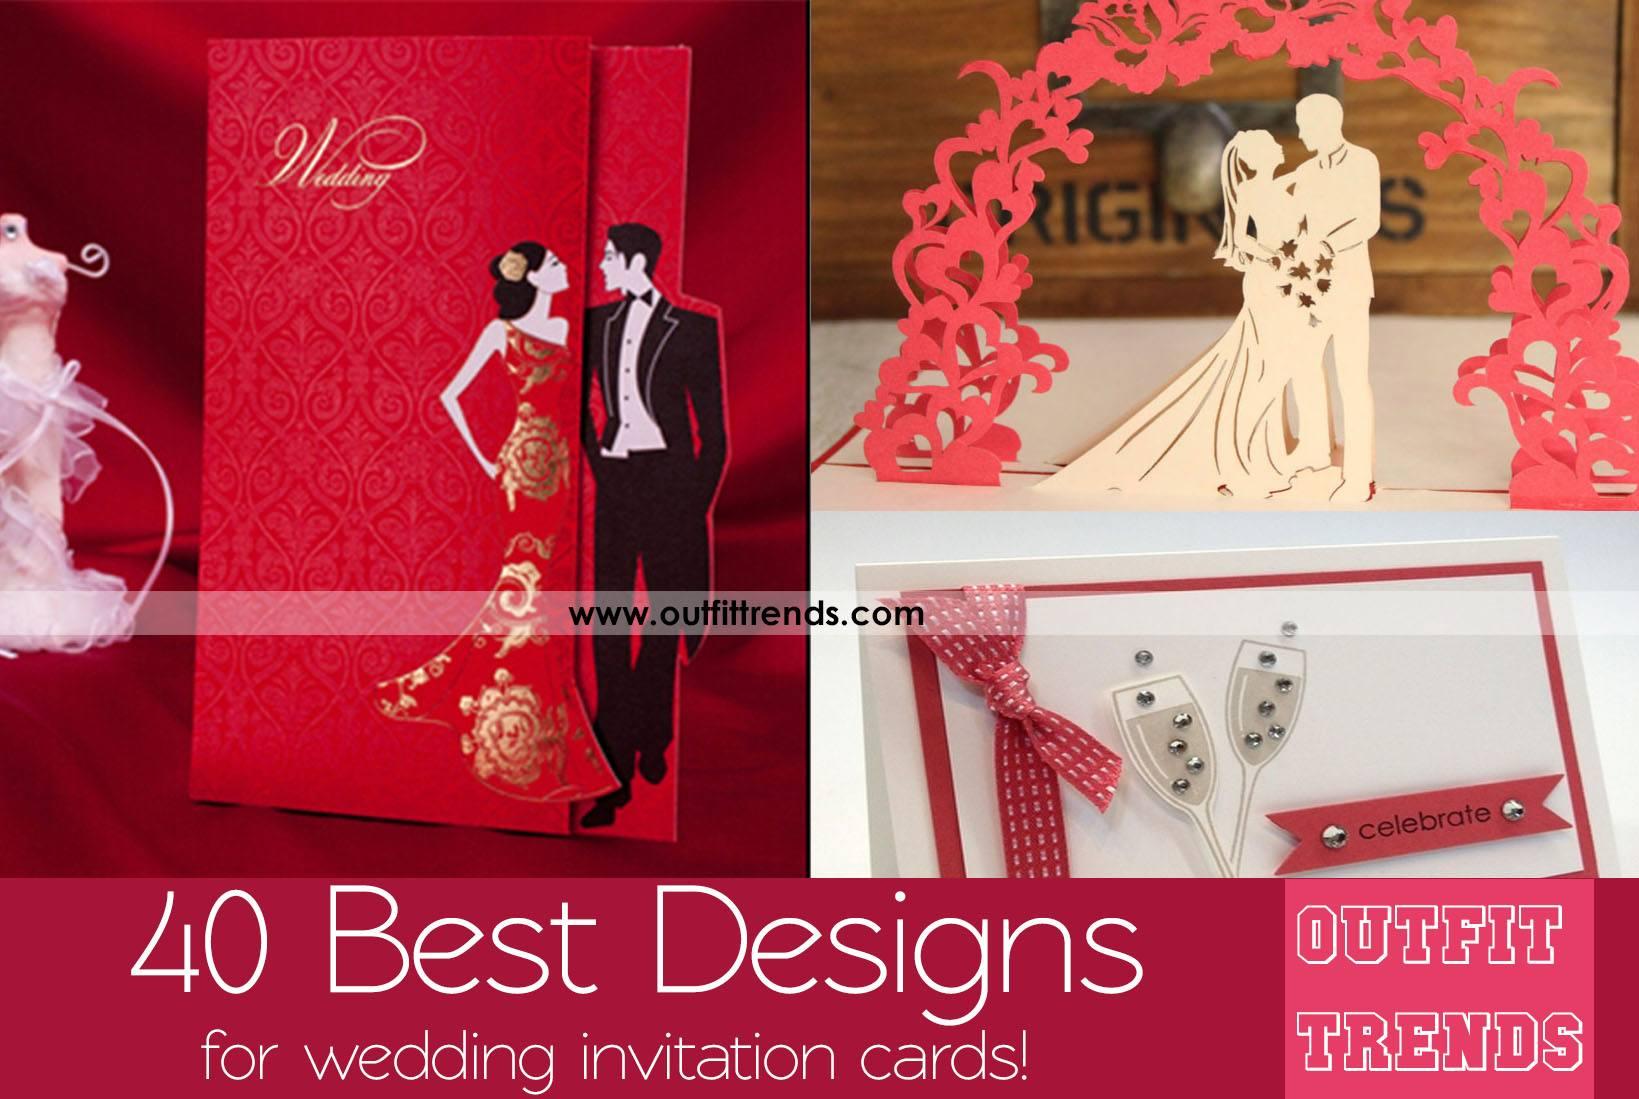 40 Best Wedding Invitation Cards And Creativity Ideas